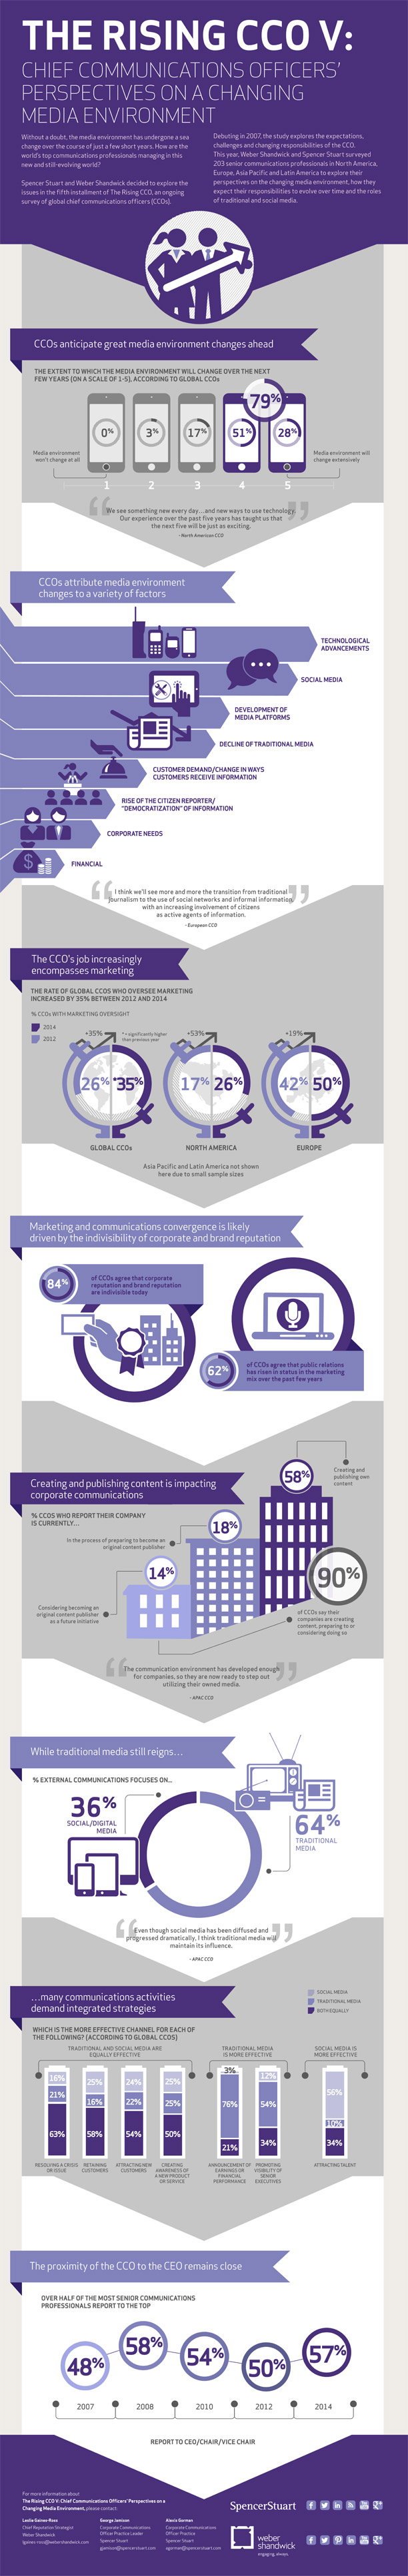 Infographie 207 - rising-cco-v-infographic